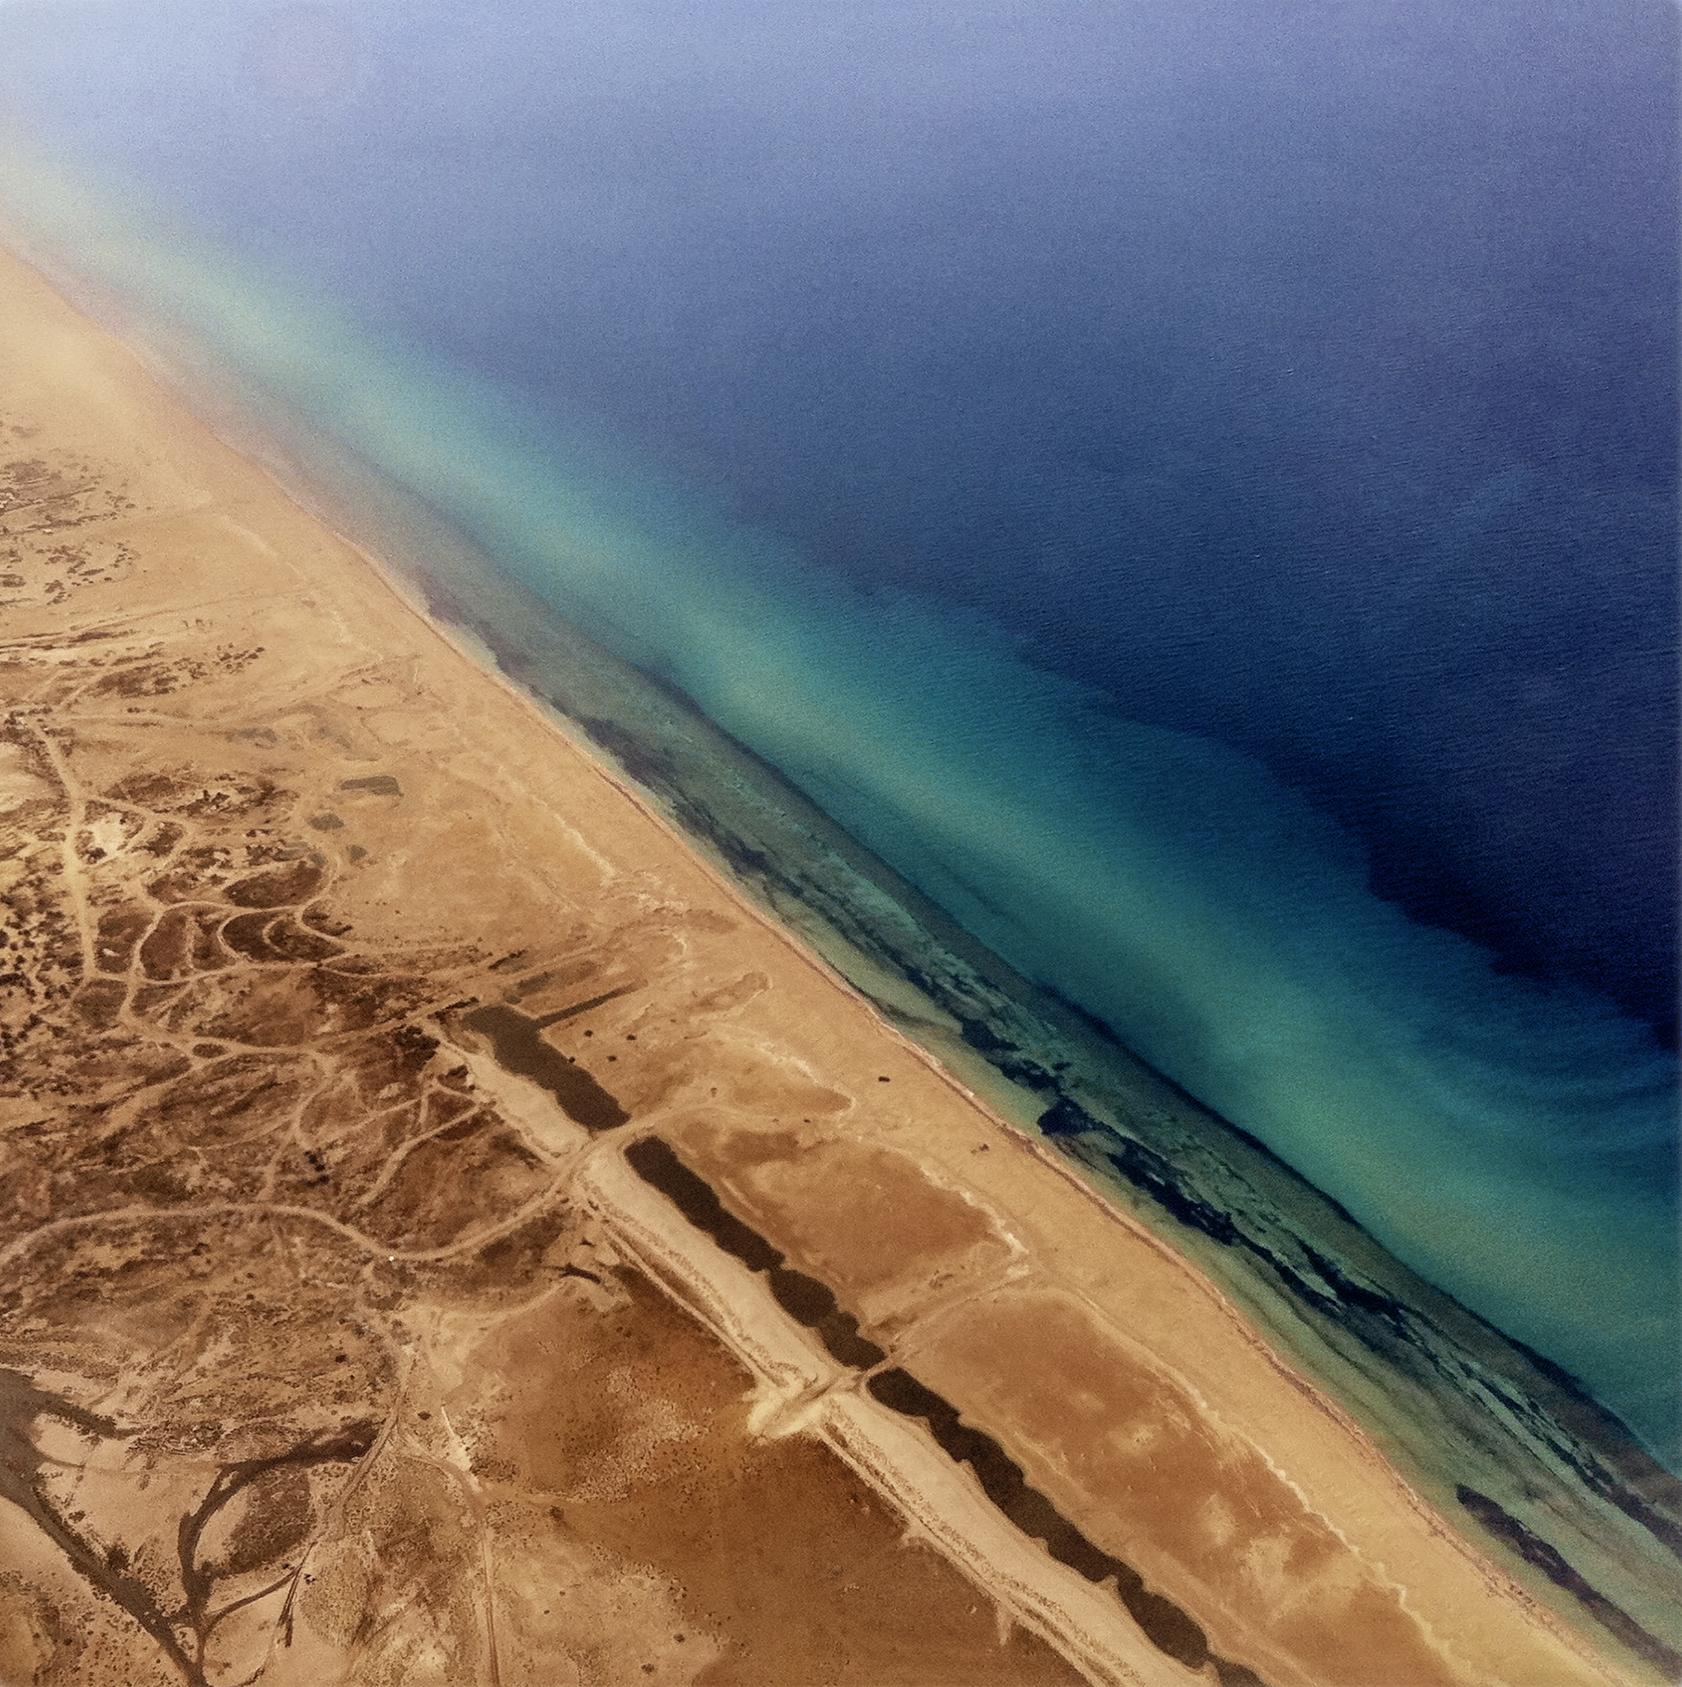 Libyan_Sugar_MCB_12.jpg#asset:963